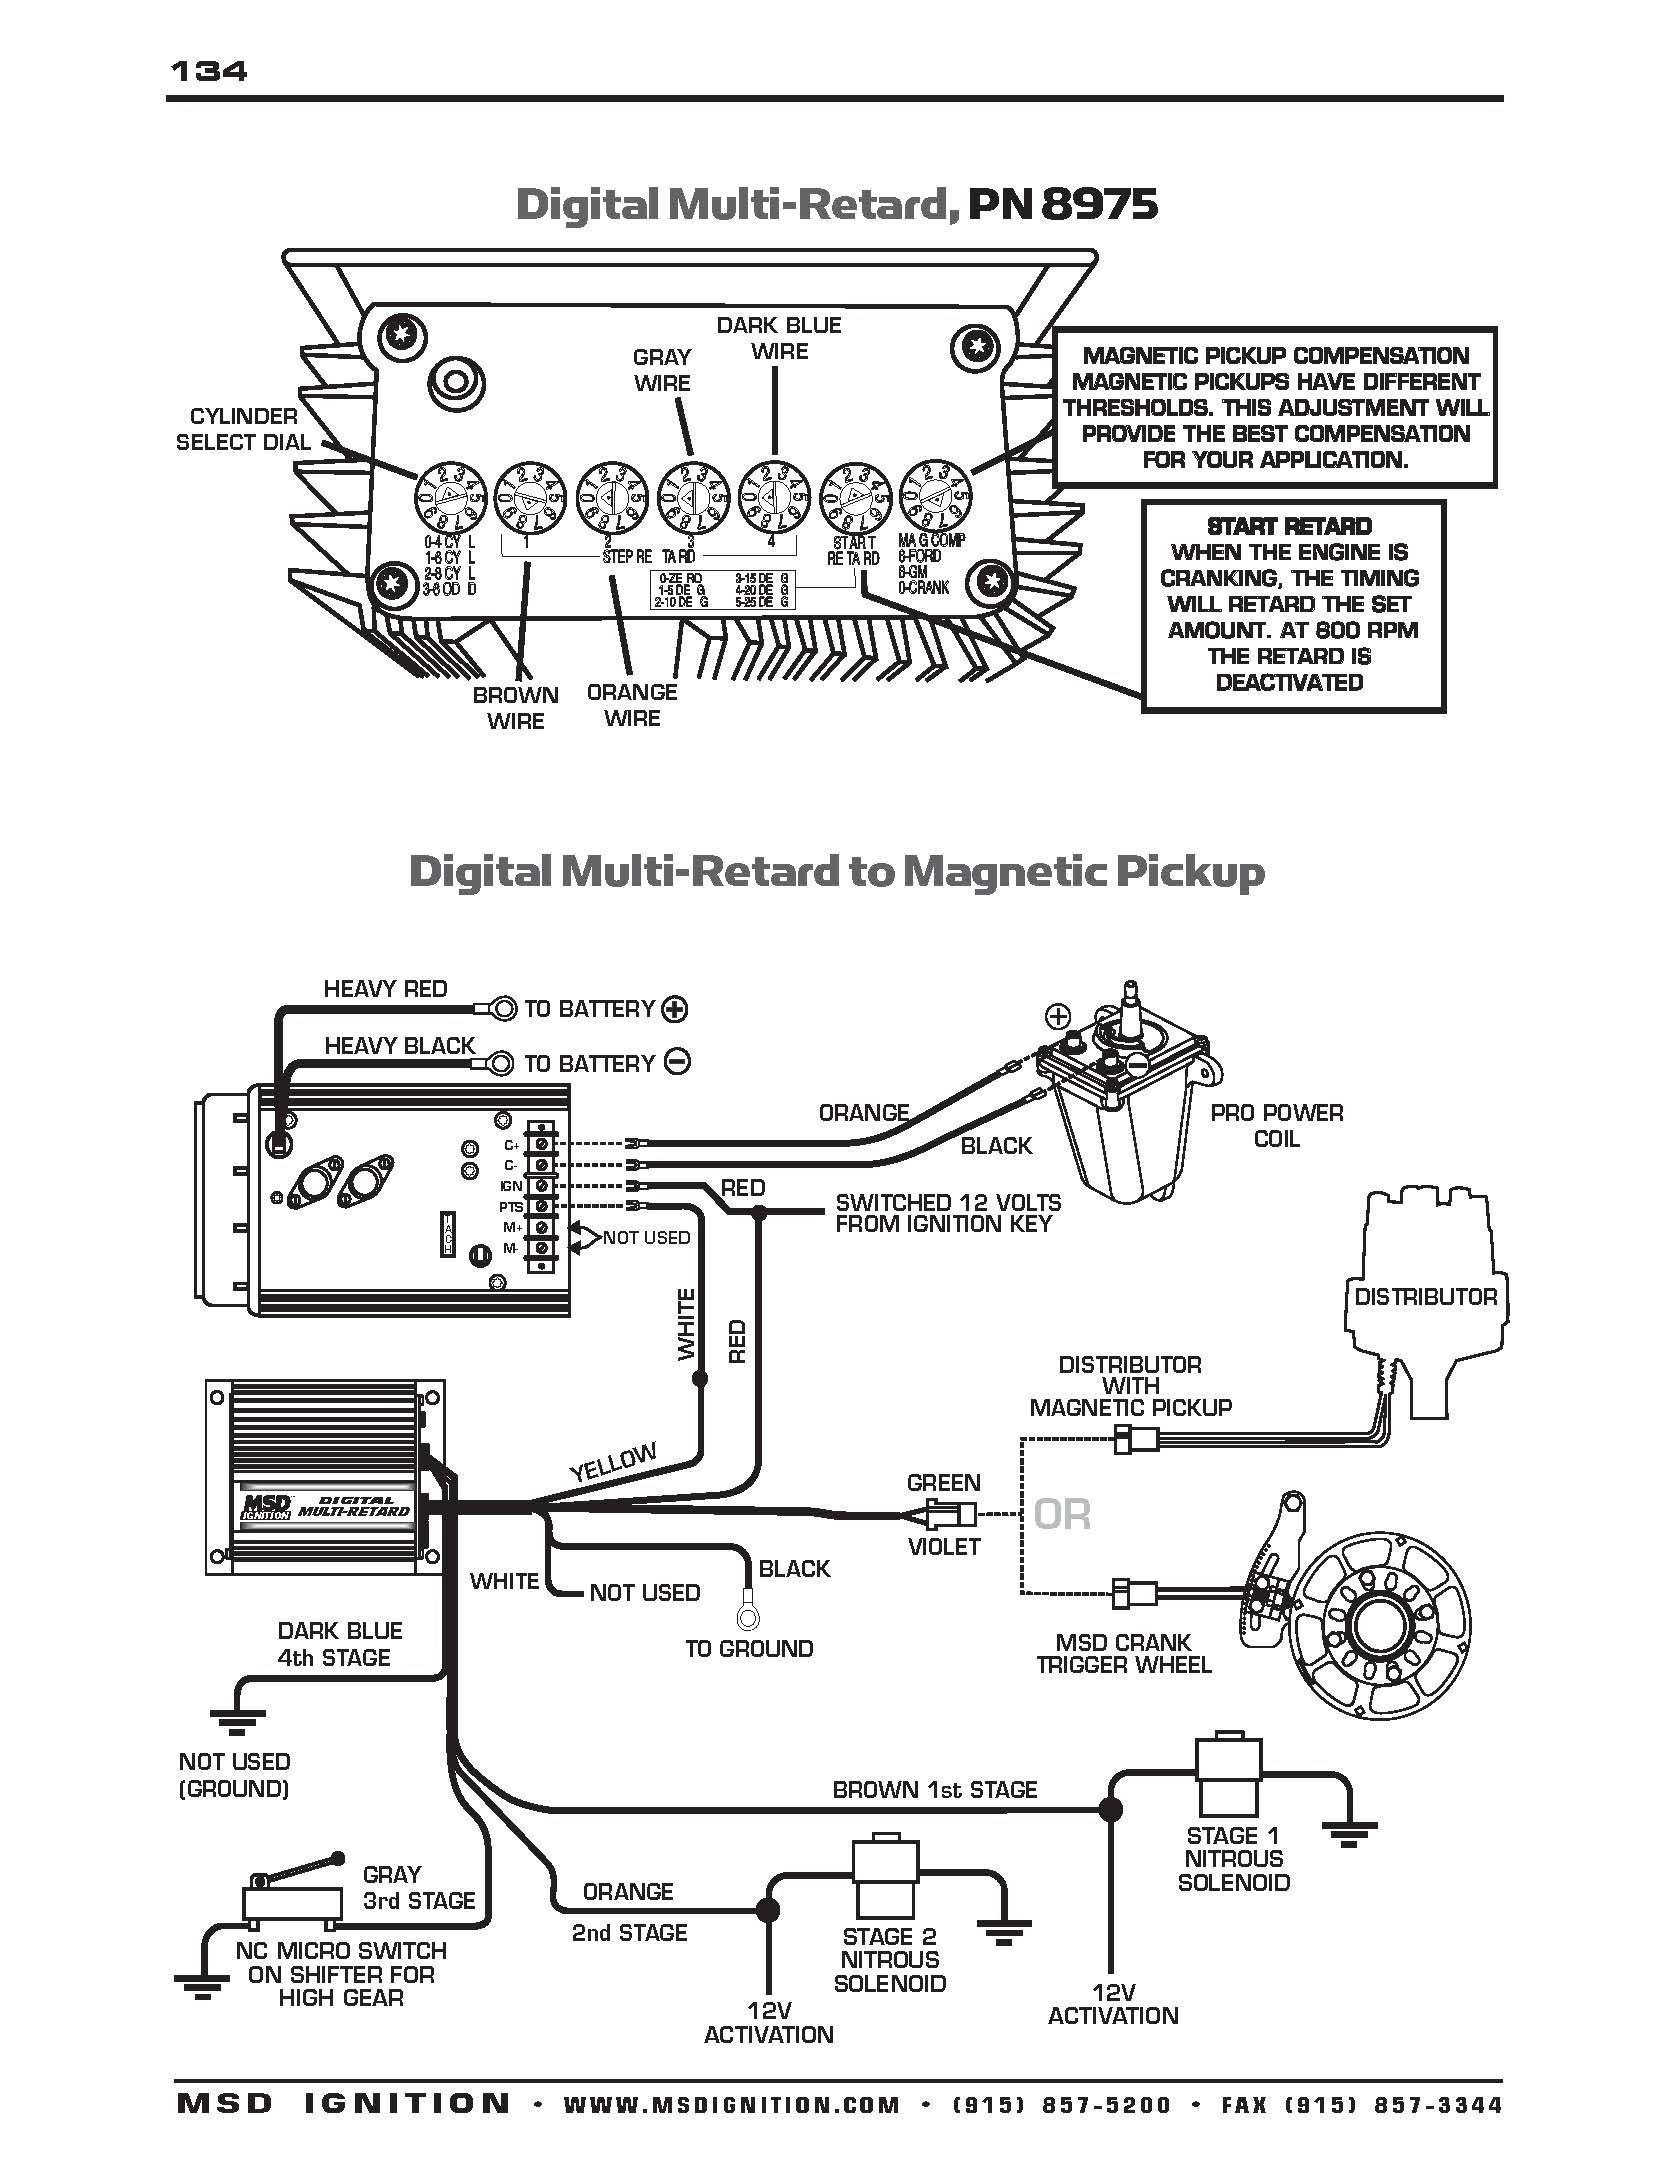 Wiring Diagram Msd Digital 6 Plus Ignition Eclipse Diagrams Forum And Box 6al Mopar 8